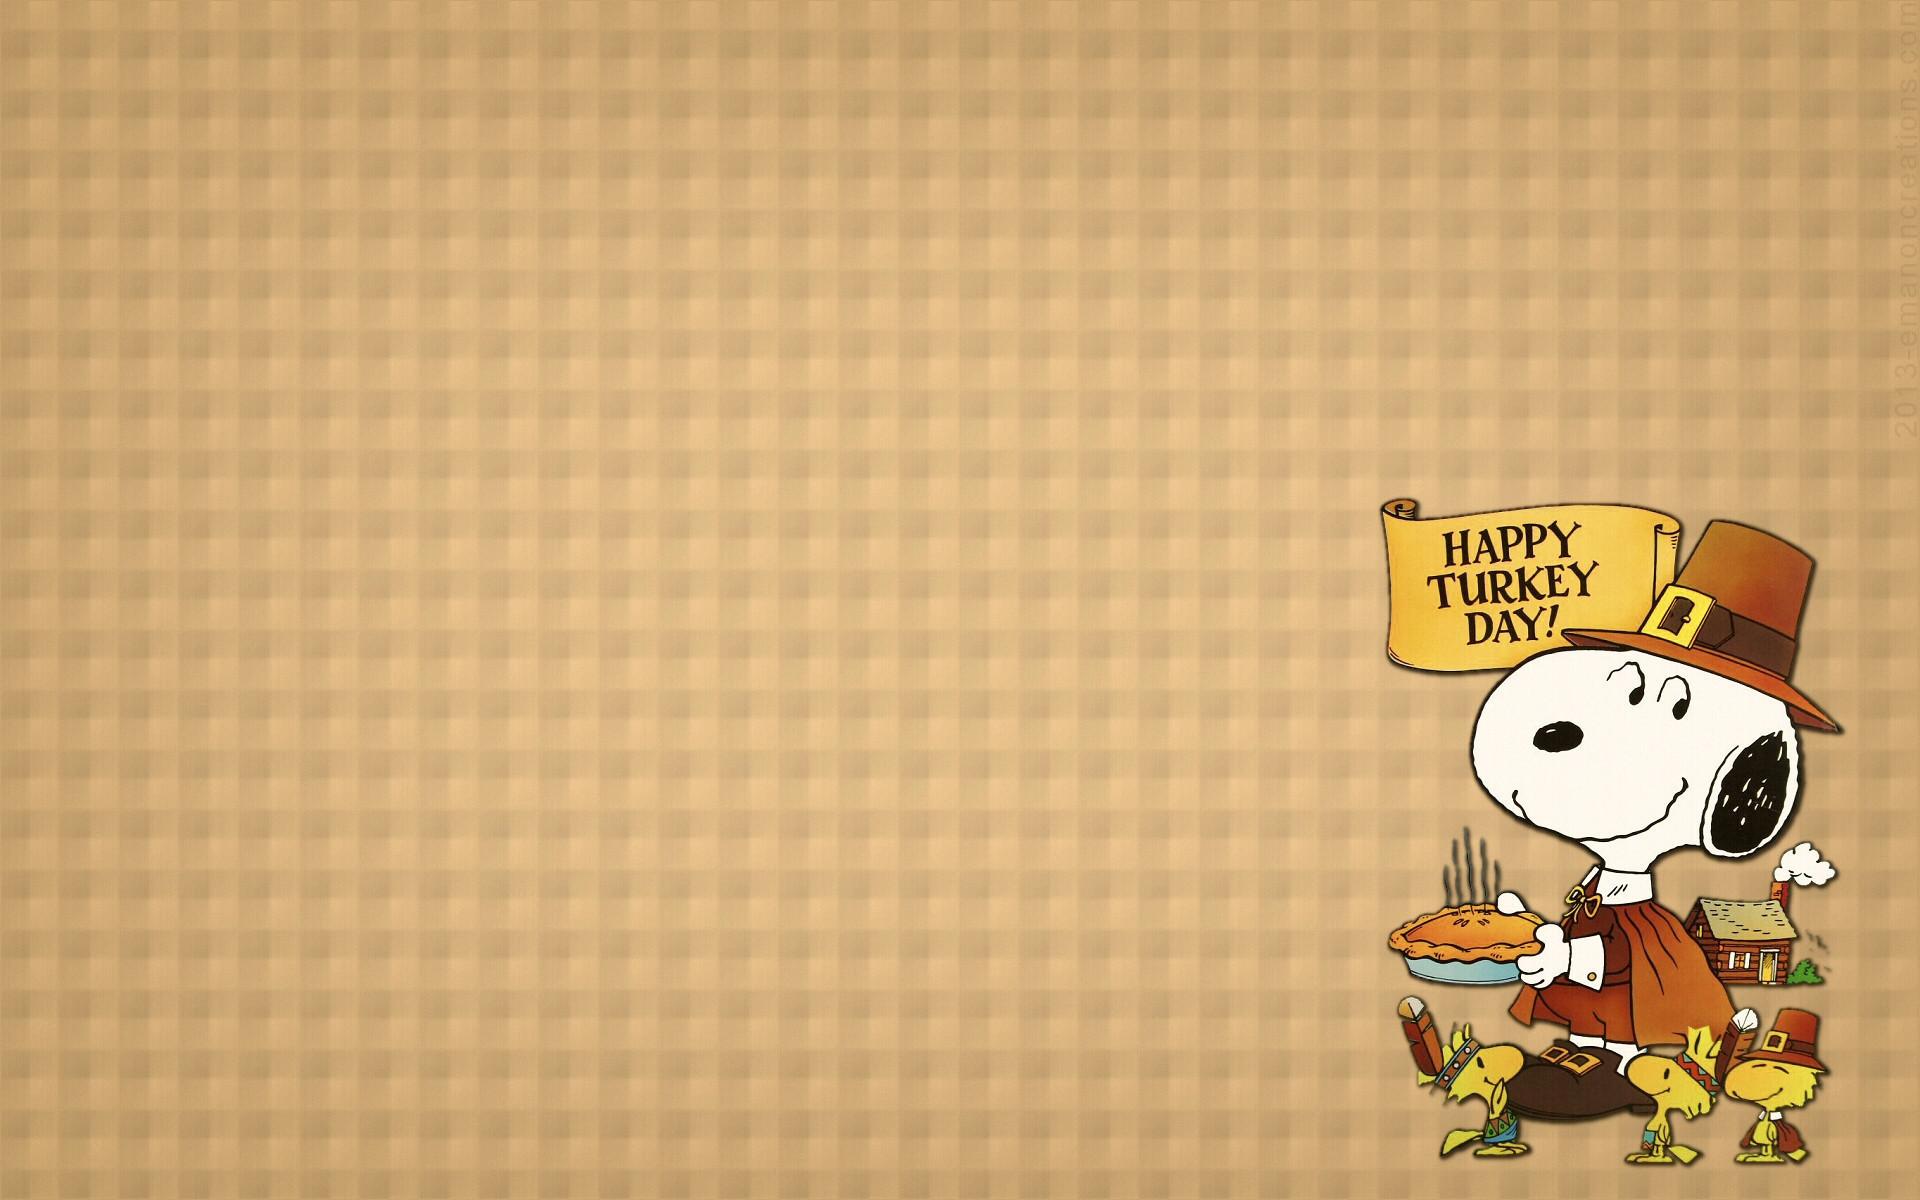 1920x1200, Res - Cute Thanksgiving Turkey Background - HD Wallpaper